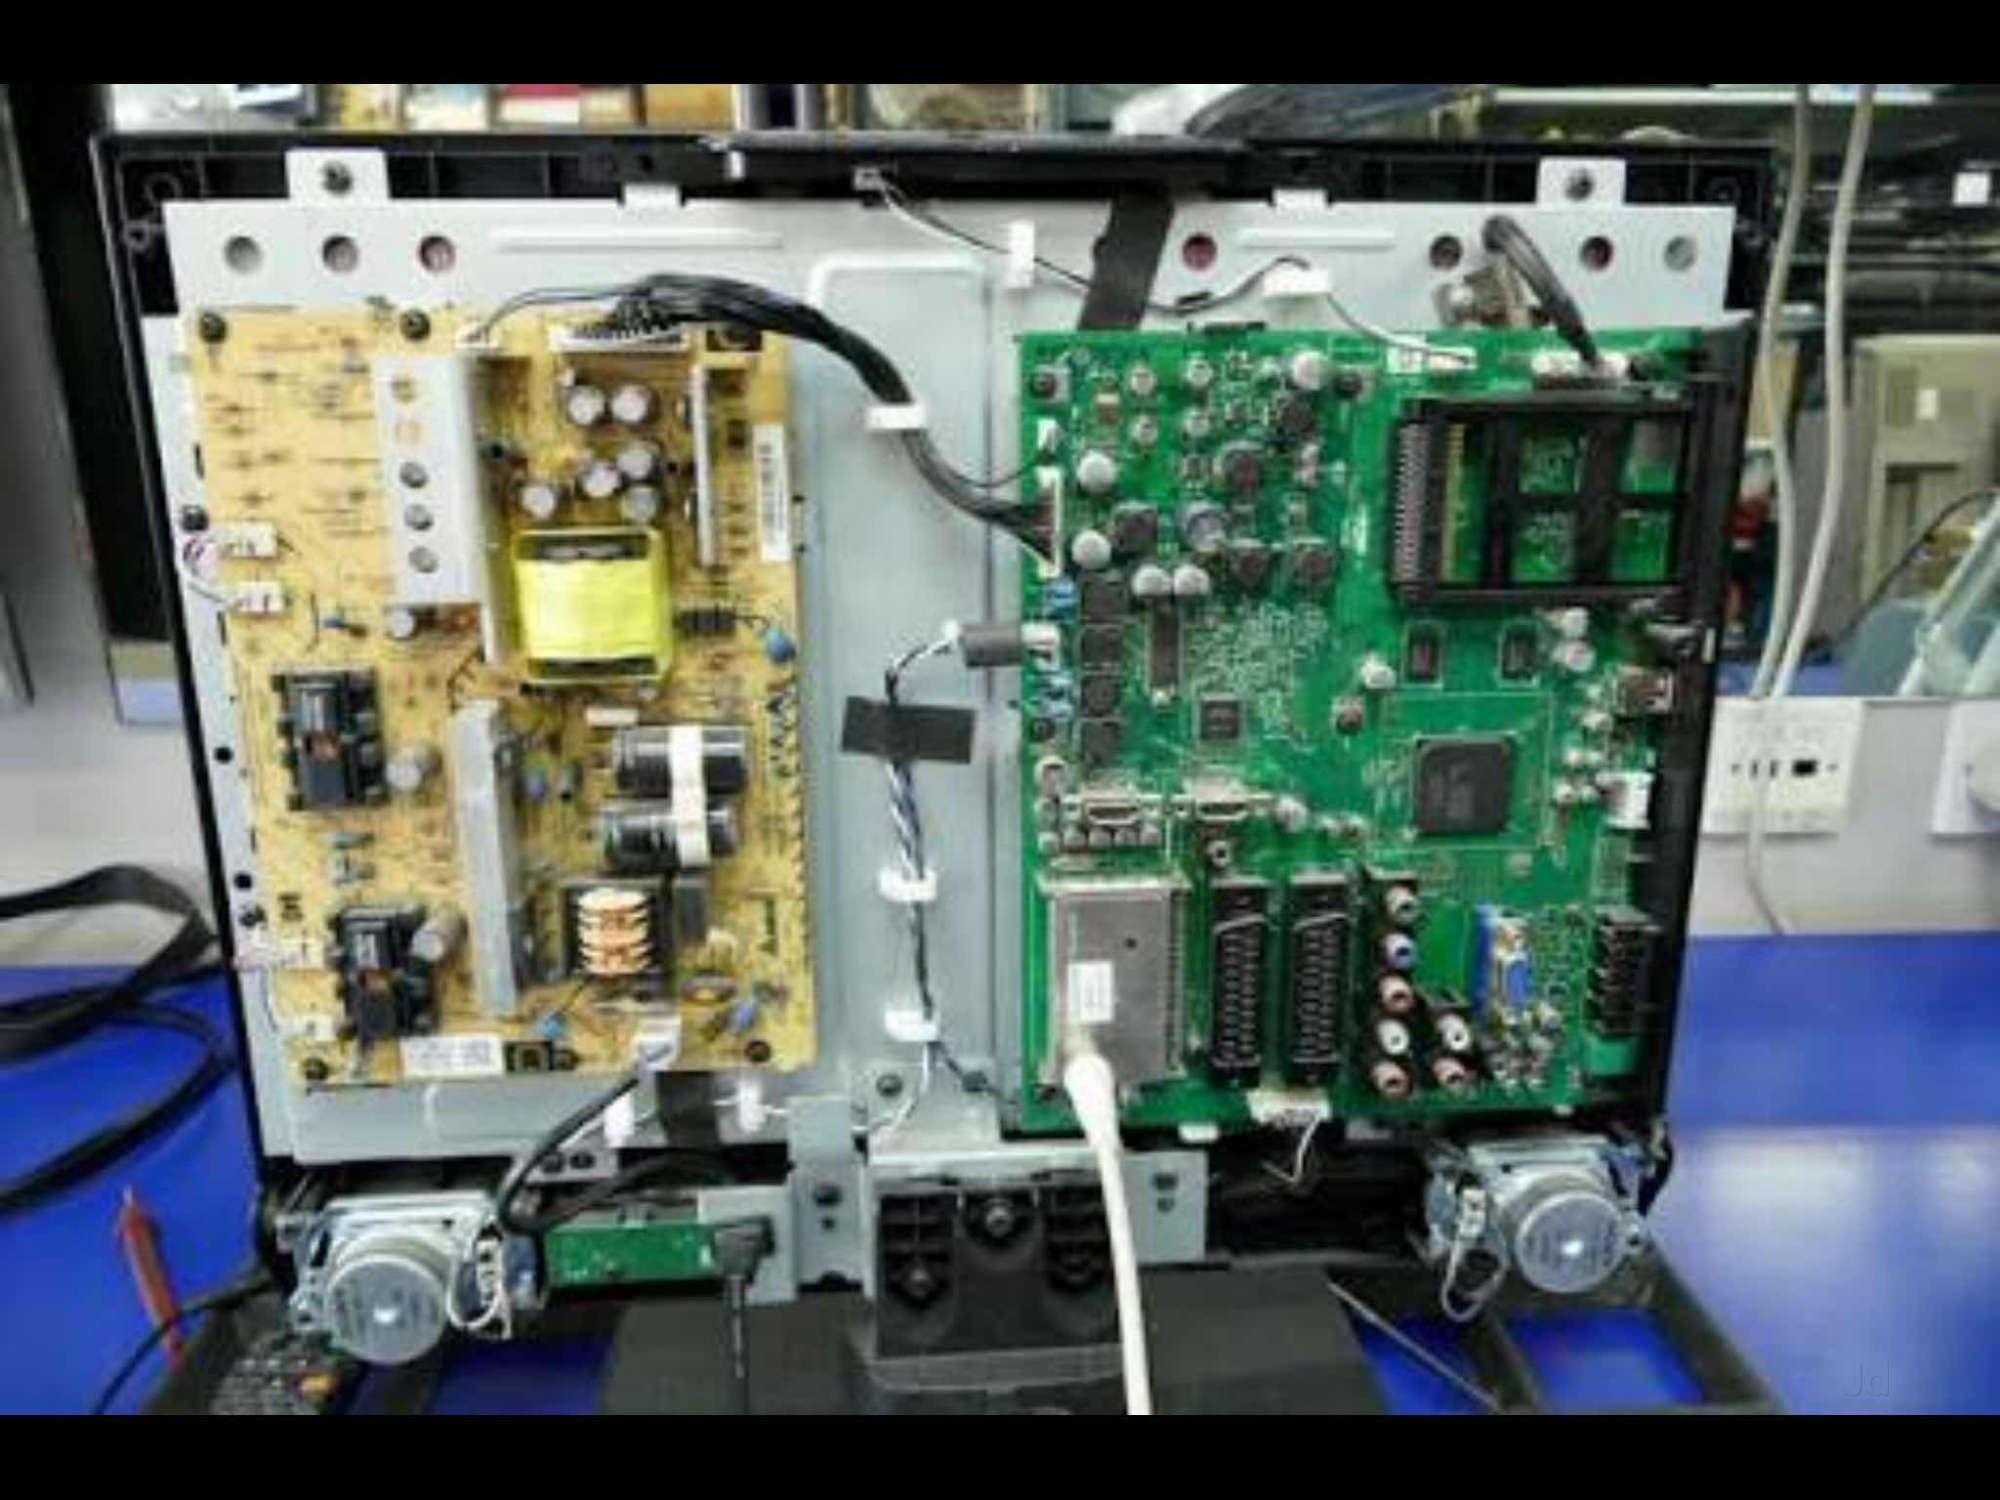 55lb5900 Uv 55 Inch 1080p Led Tv Internal Circuit Boards Ebay